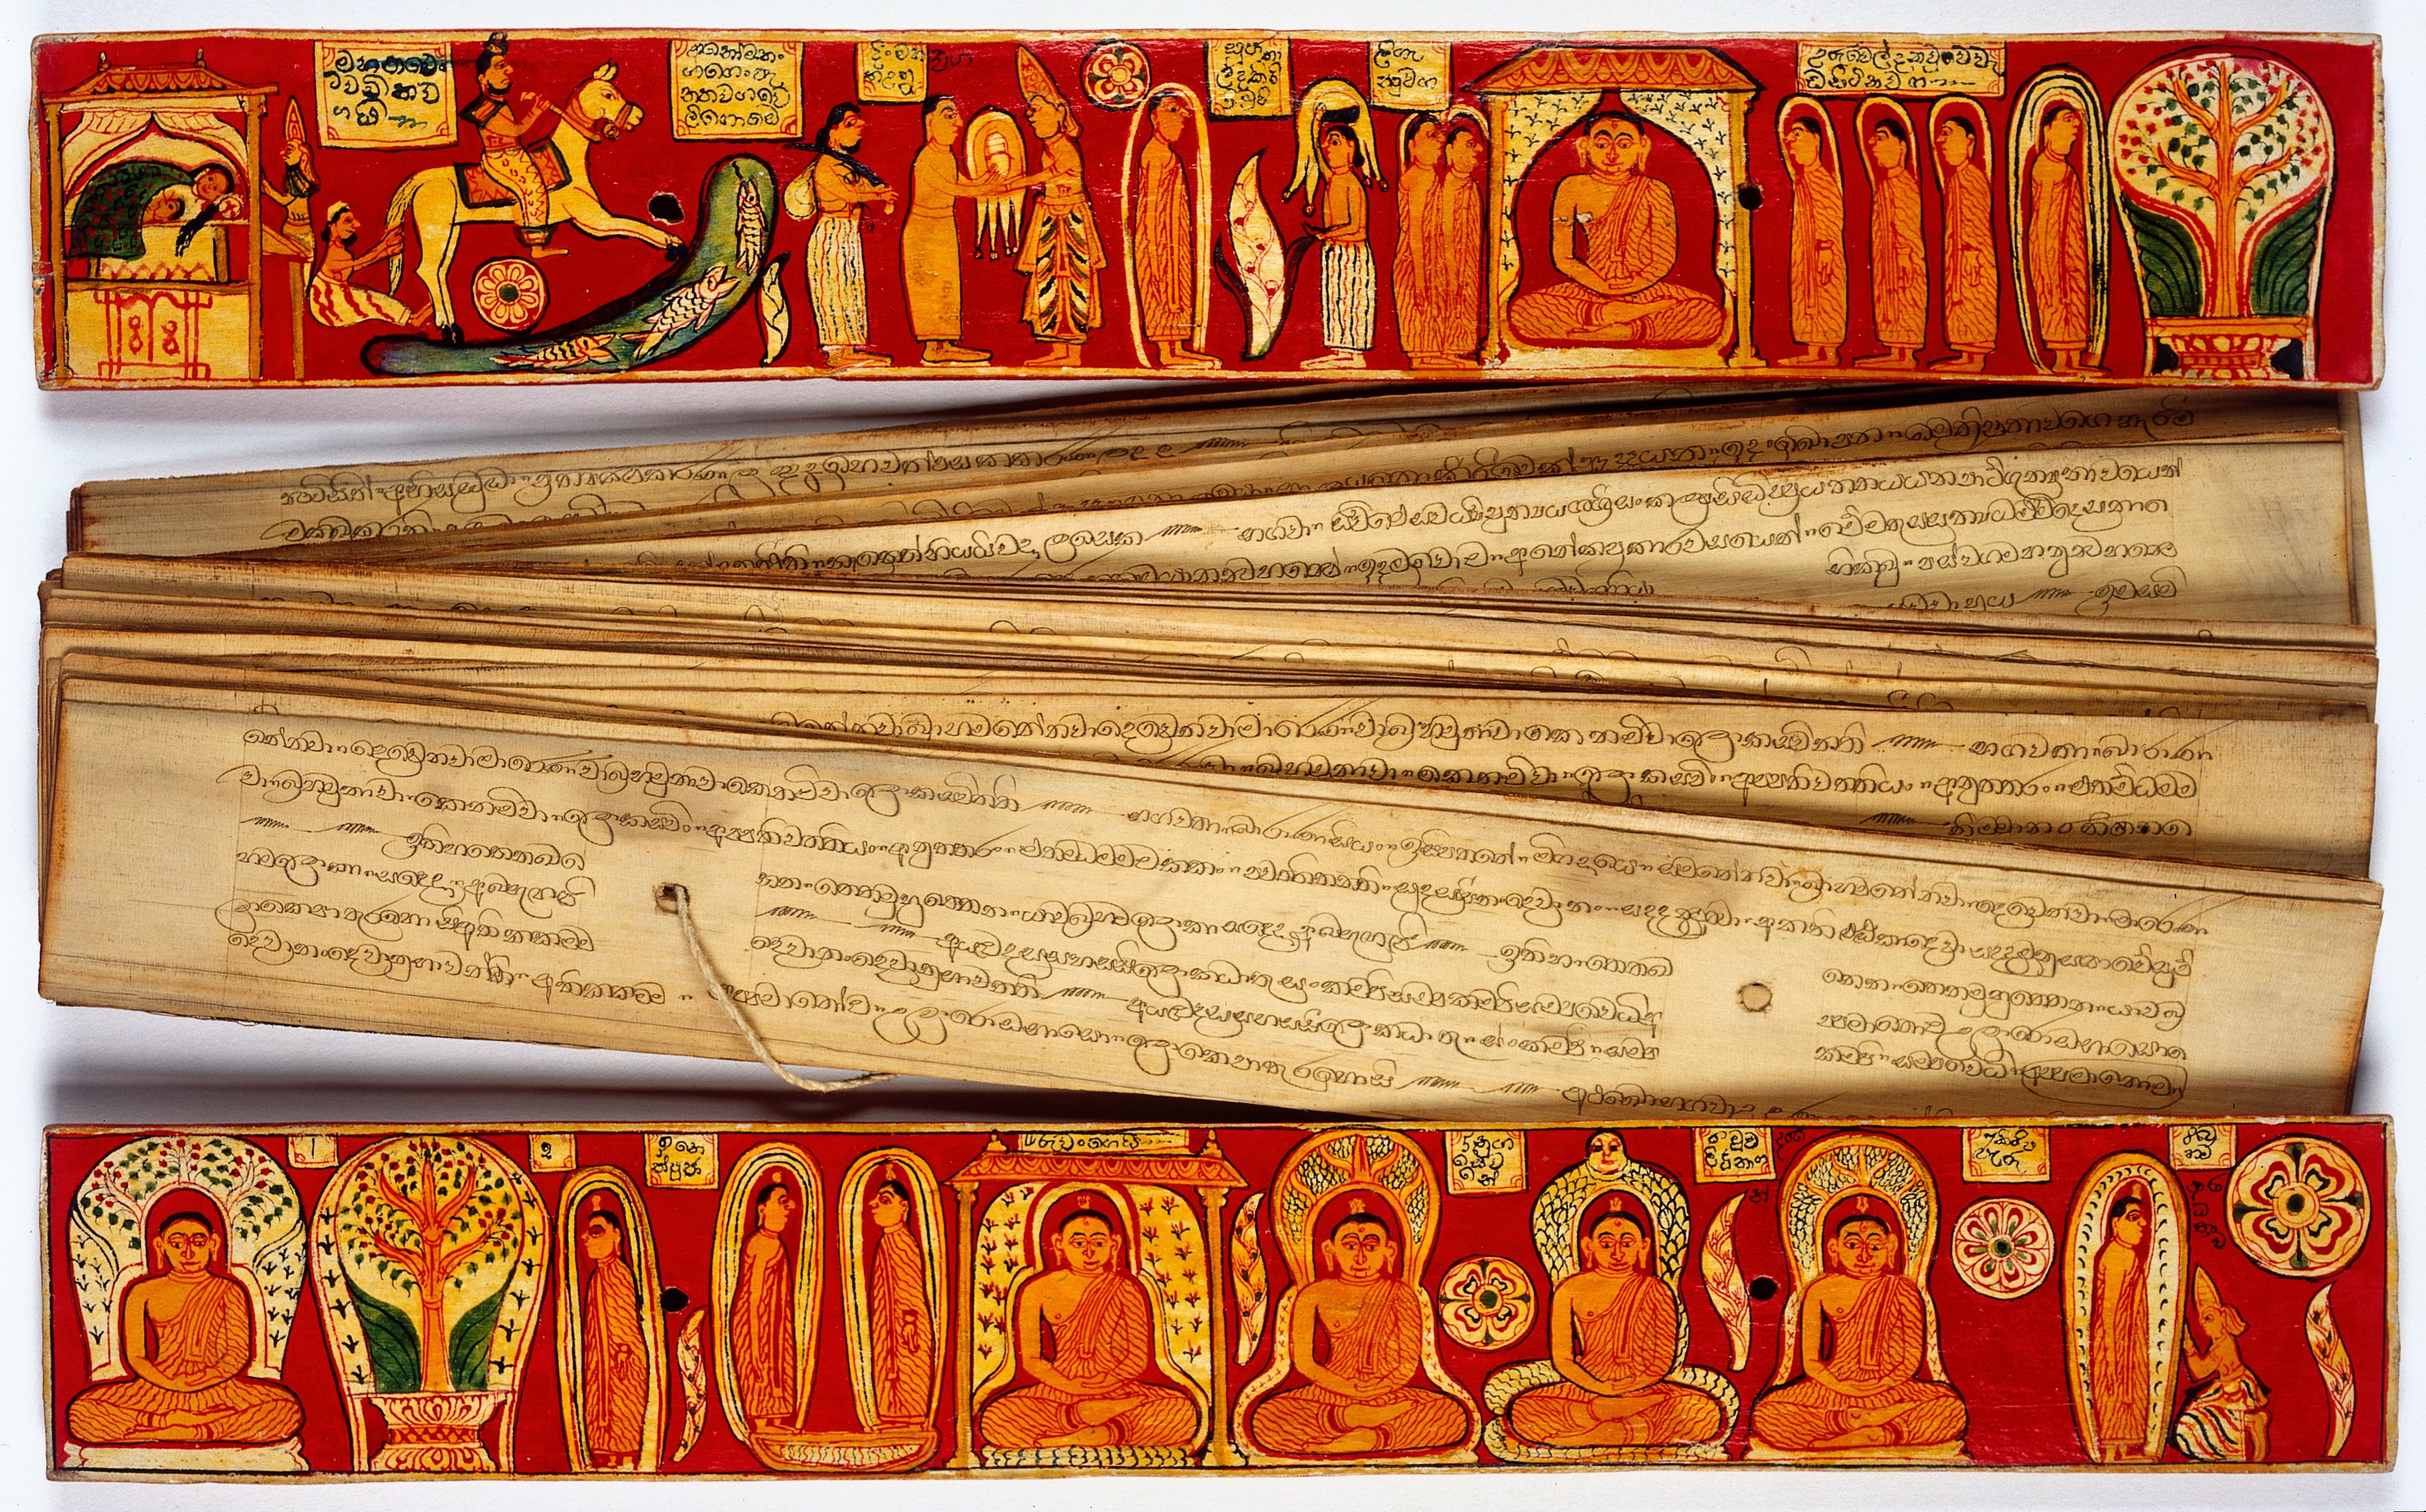 Saṃyutta Nikāya - Wikipedia